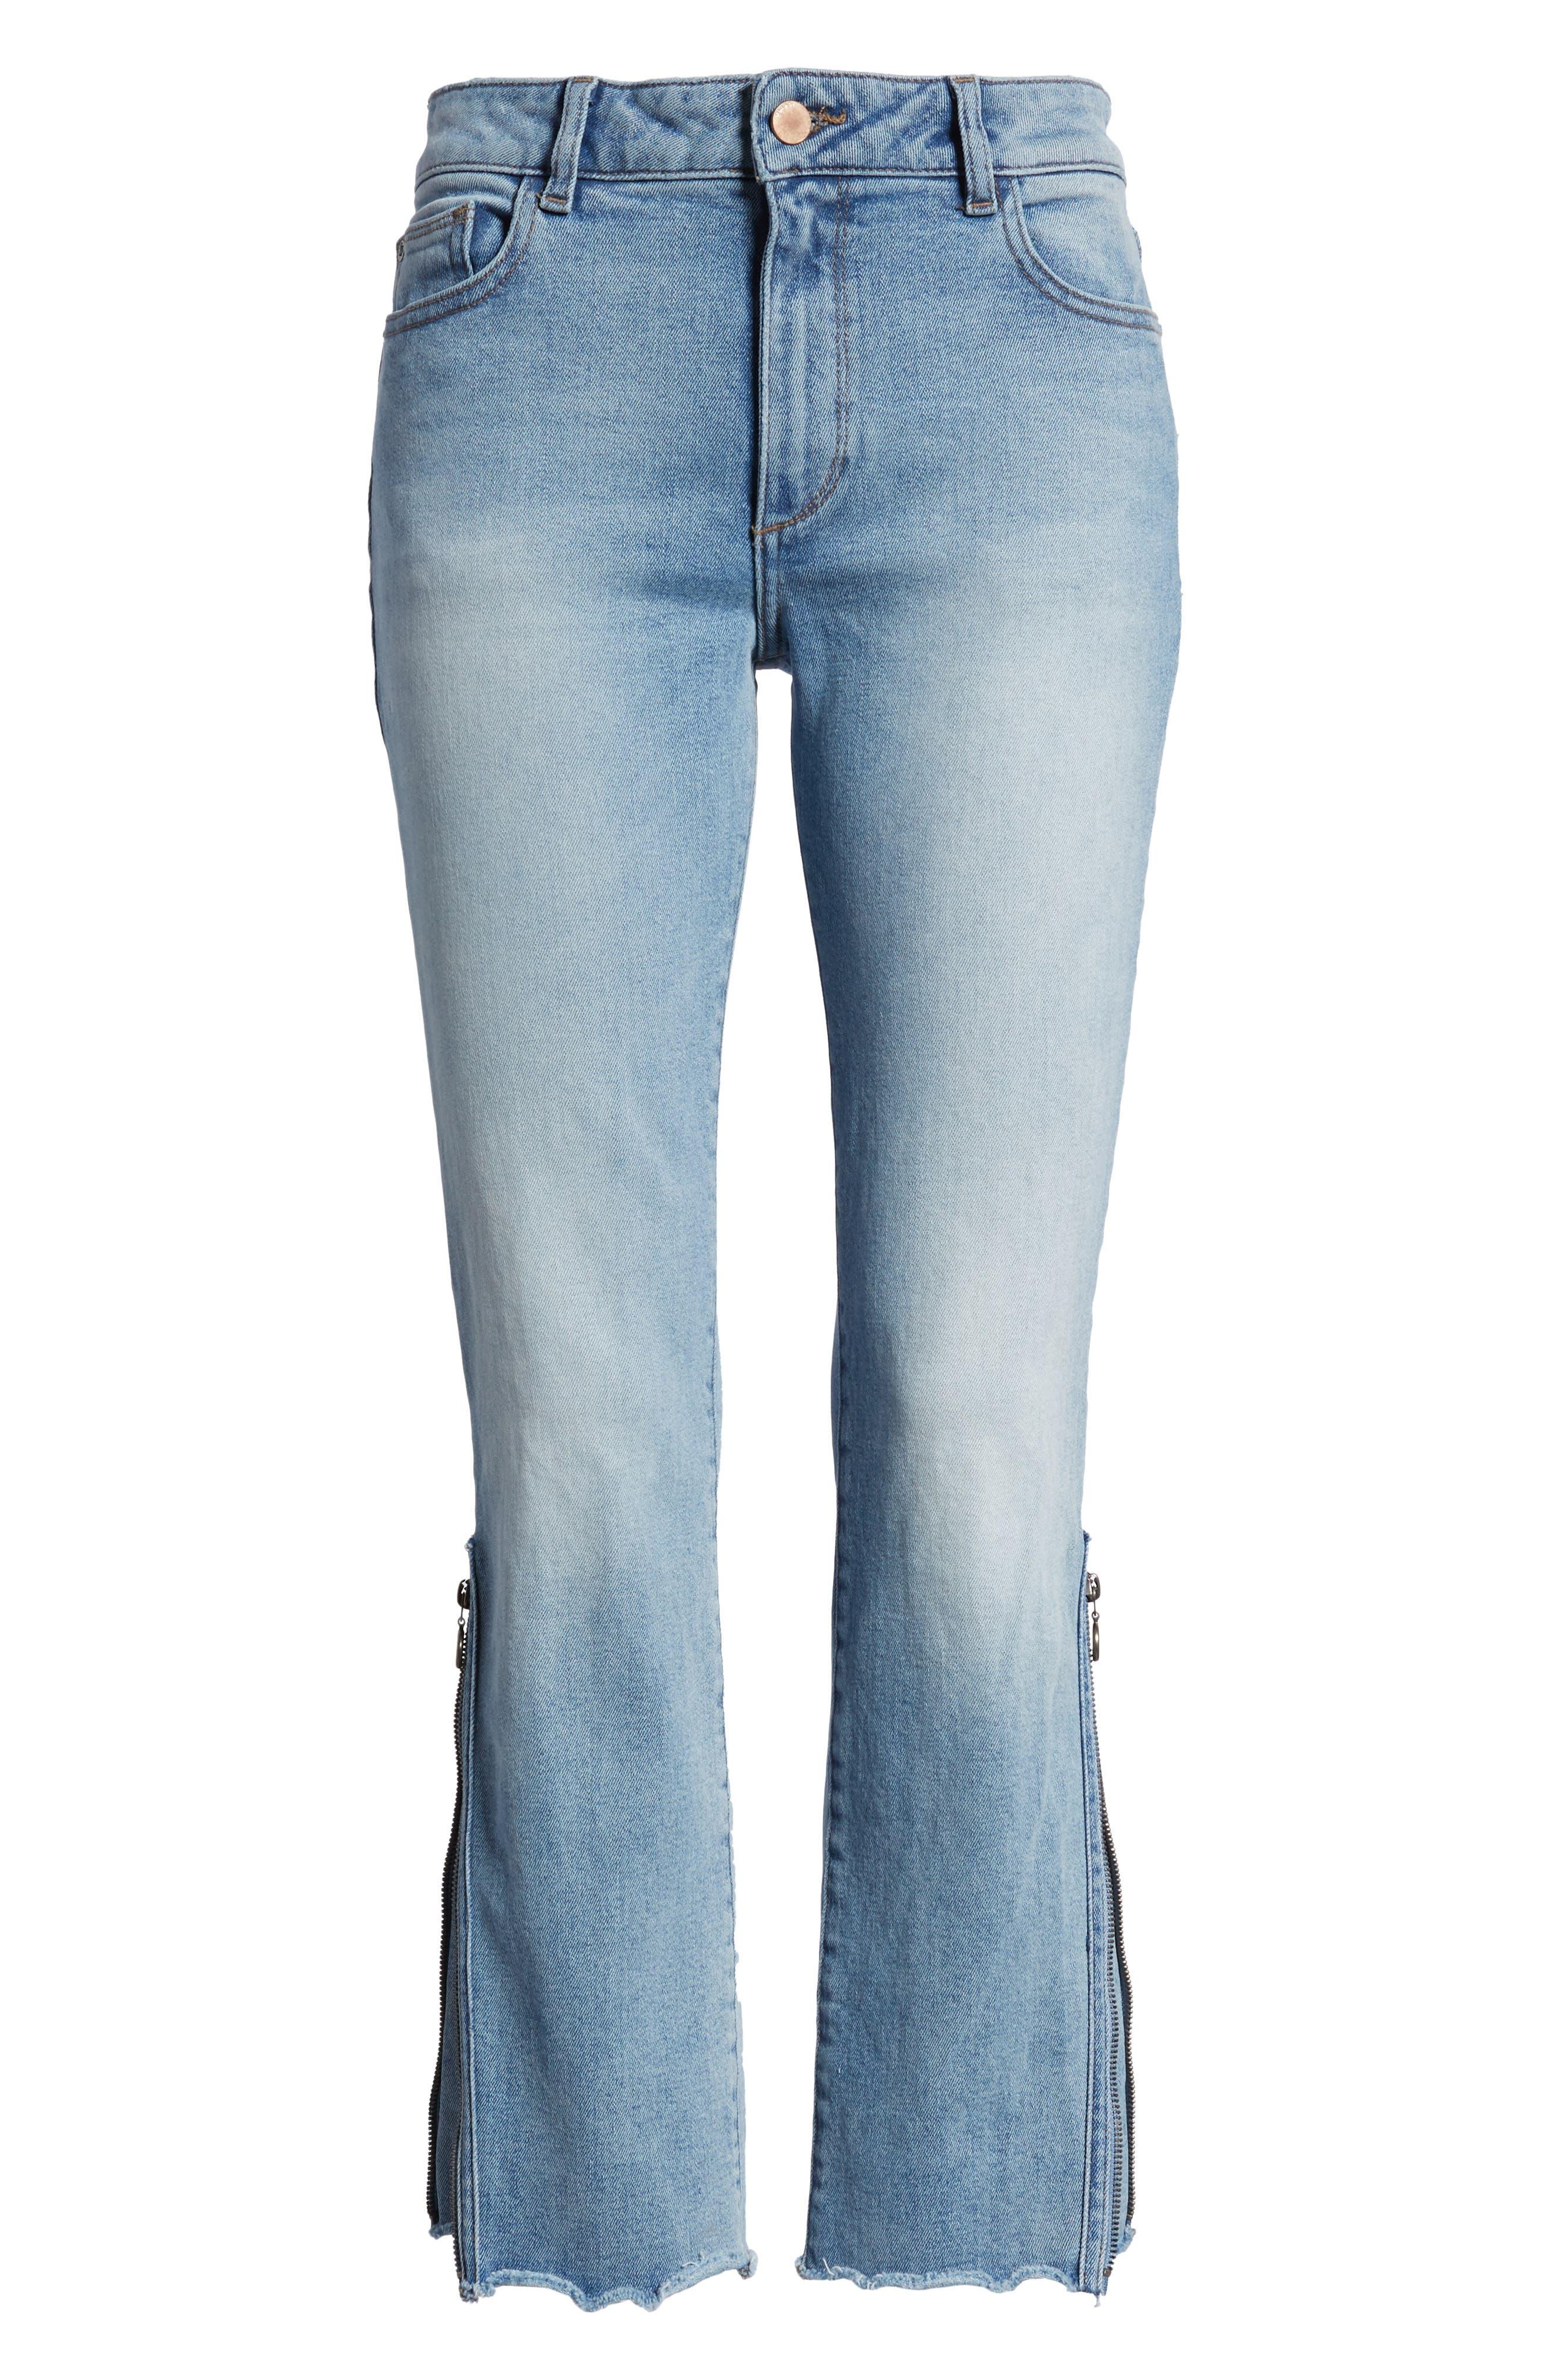 Mara Instasculpt Ankle Straight Leg Jeans,                             Alternate thumbnail 6, color,                             Marina